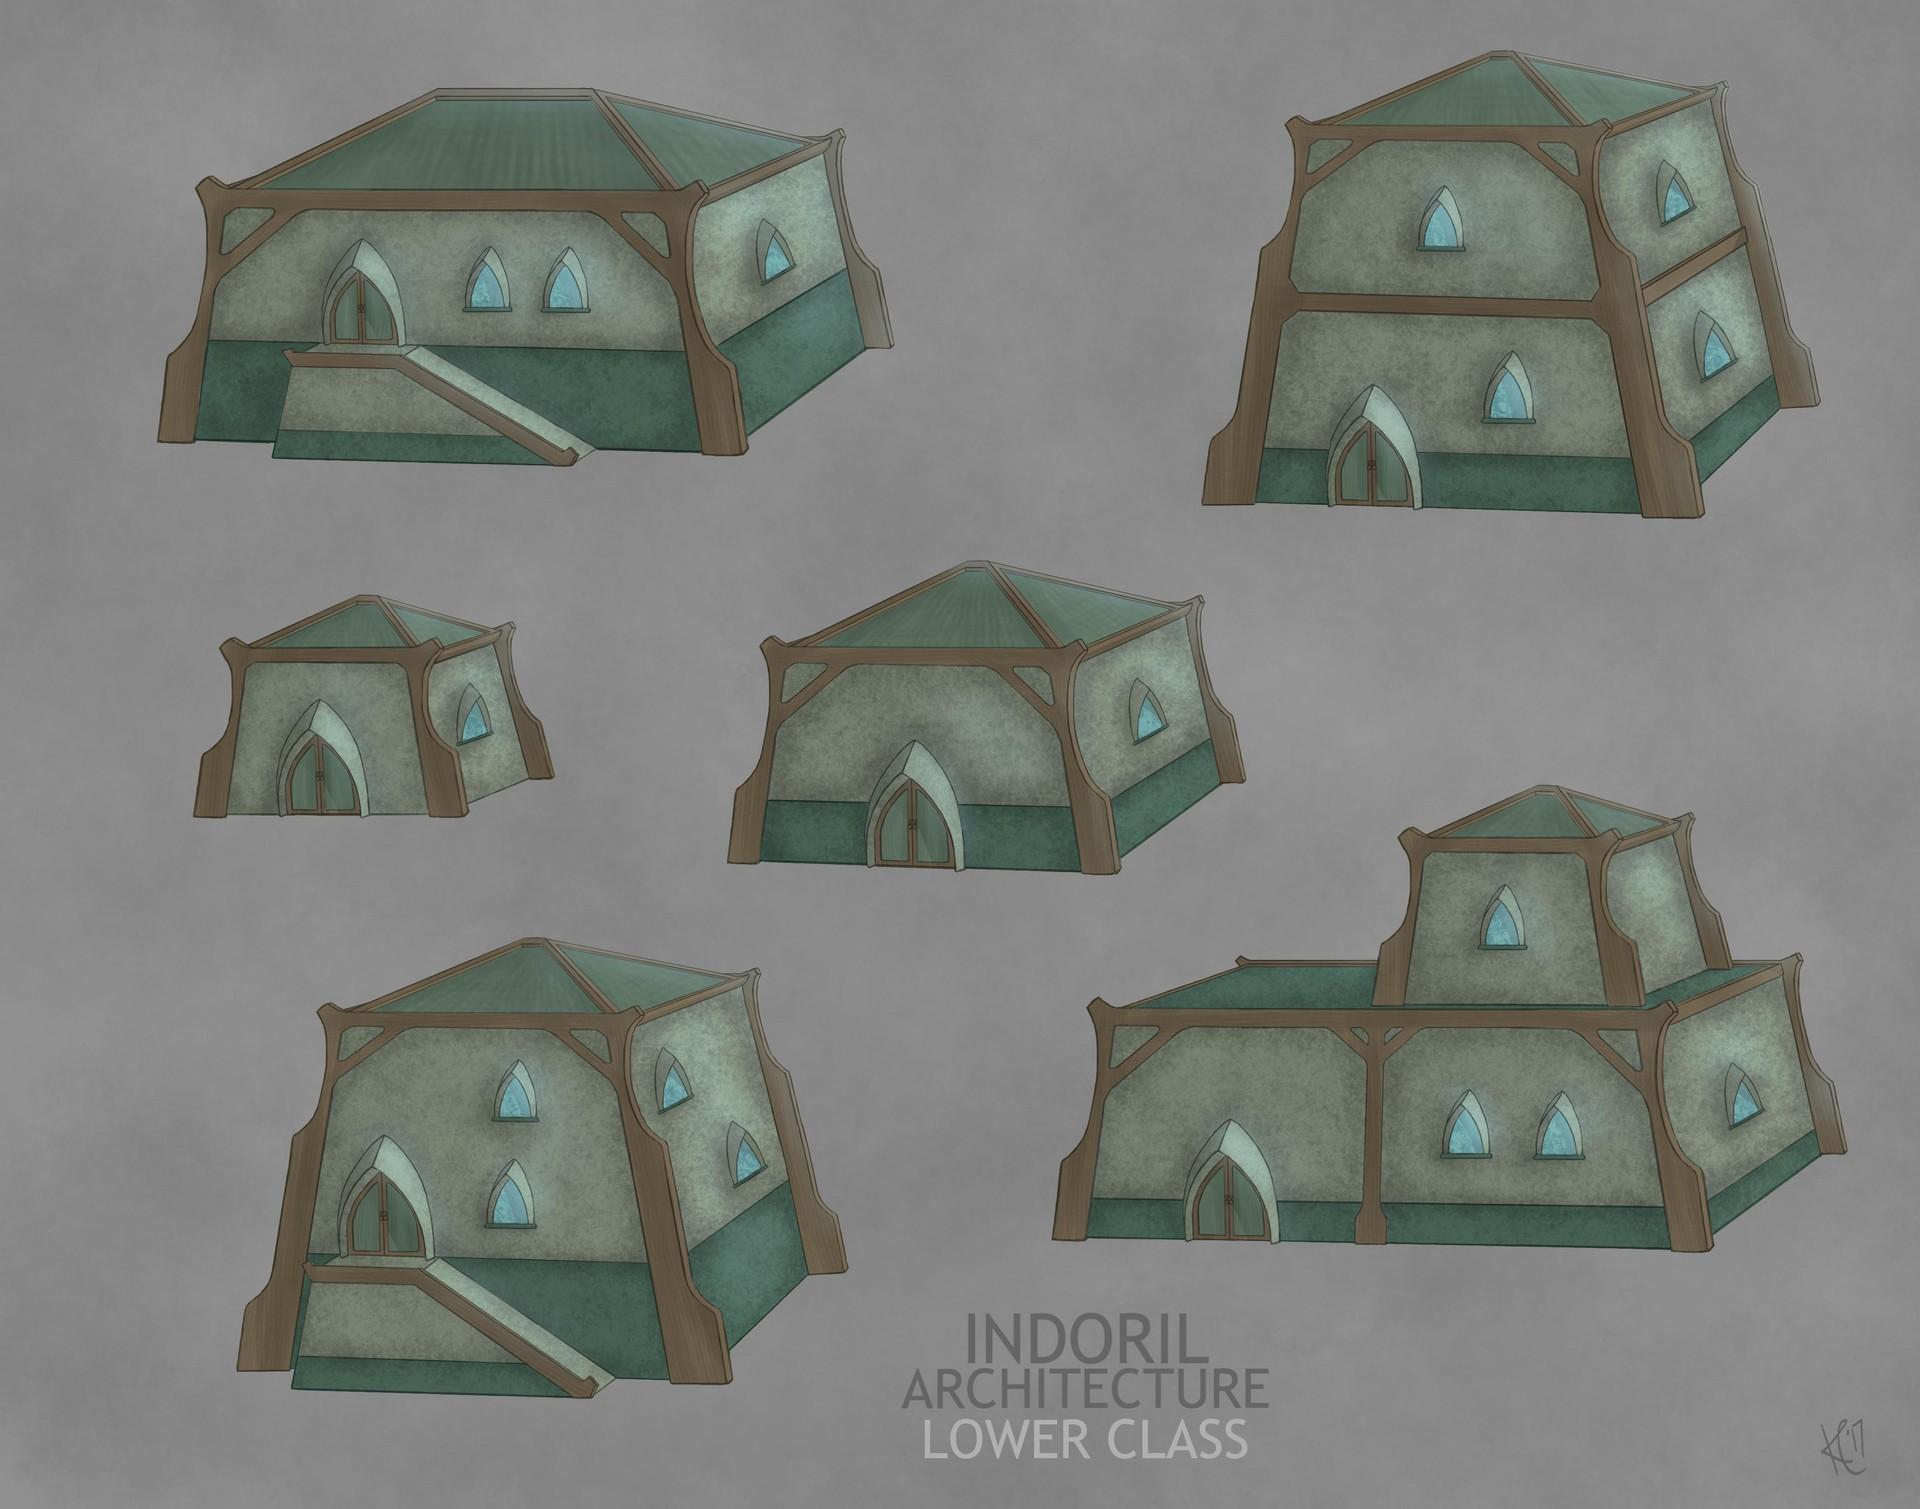 ArtStation - Morrowind Architecture, Kate Landels